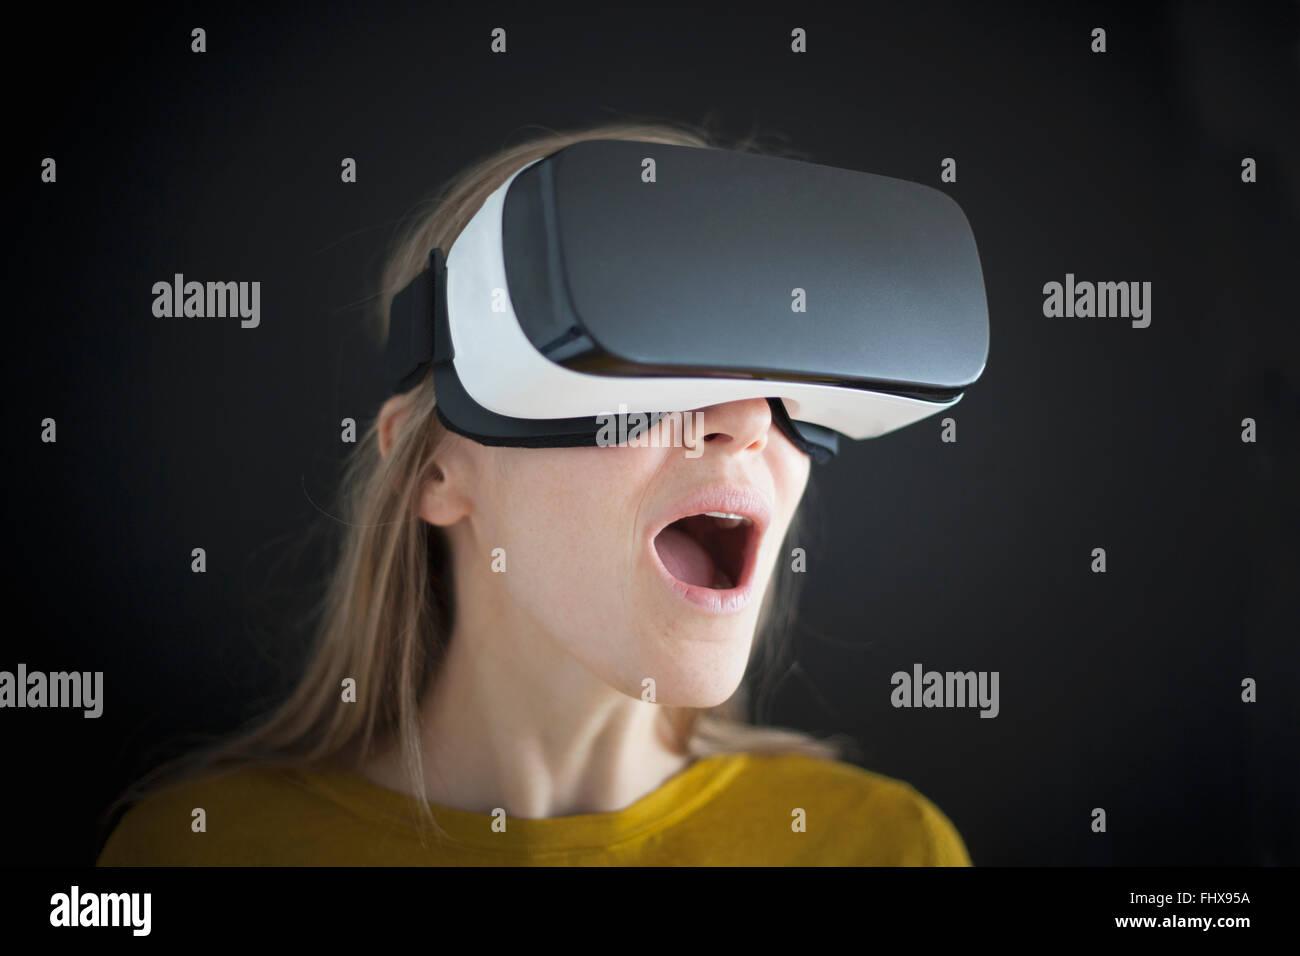 Astonished woman wearing Virtual Reality Glasses - Stock Image